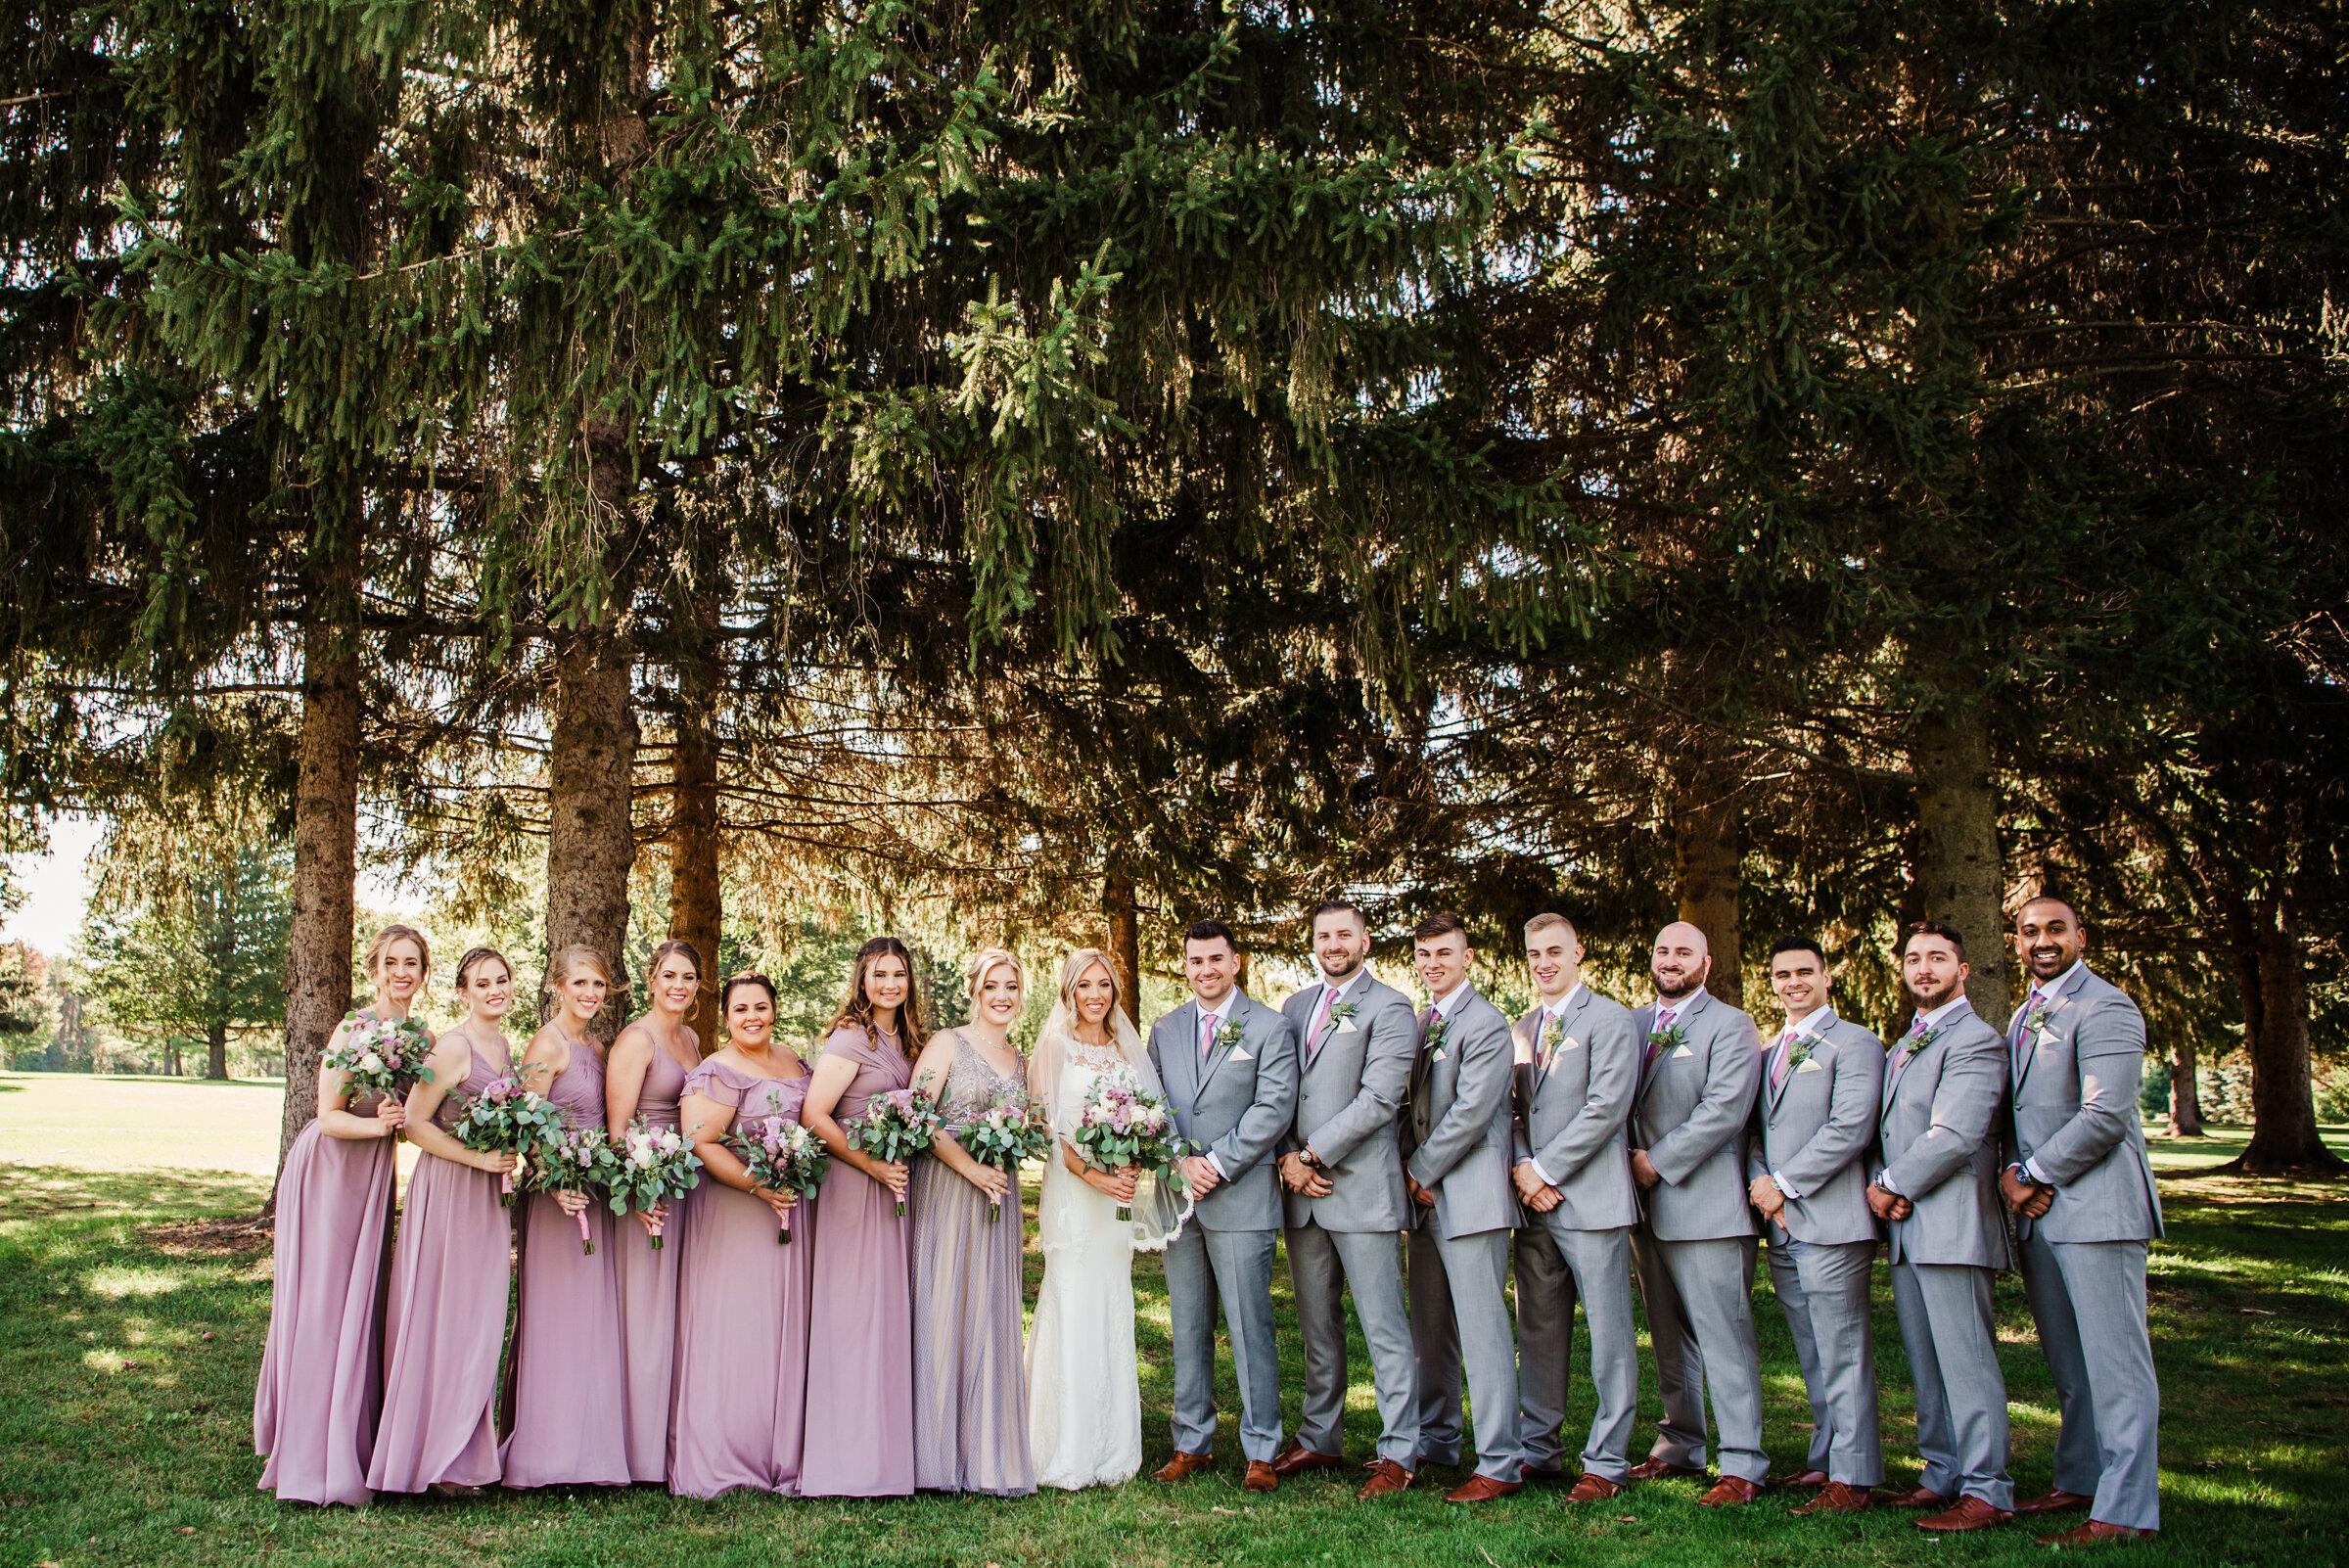 Deerfield_Country_Club_Rochester_Wedding_JILL_STUDIO_Rochester_NY_Photographer_DSC_6227.jpg